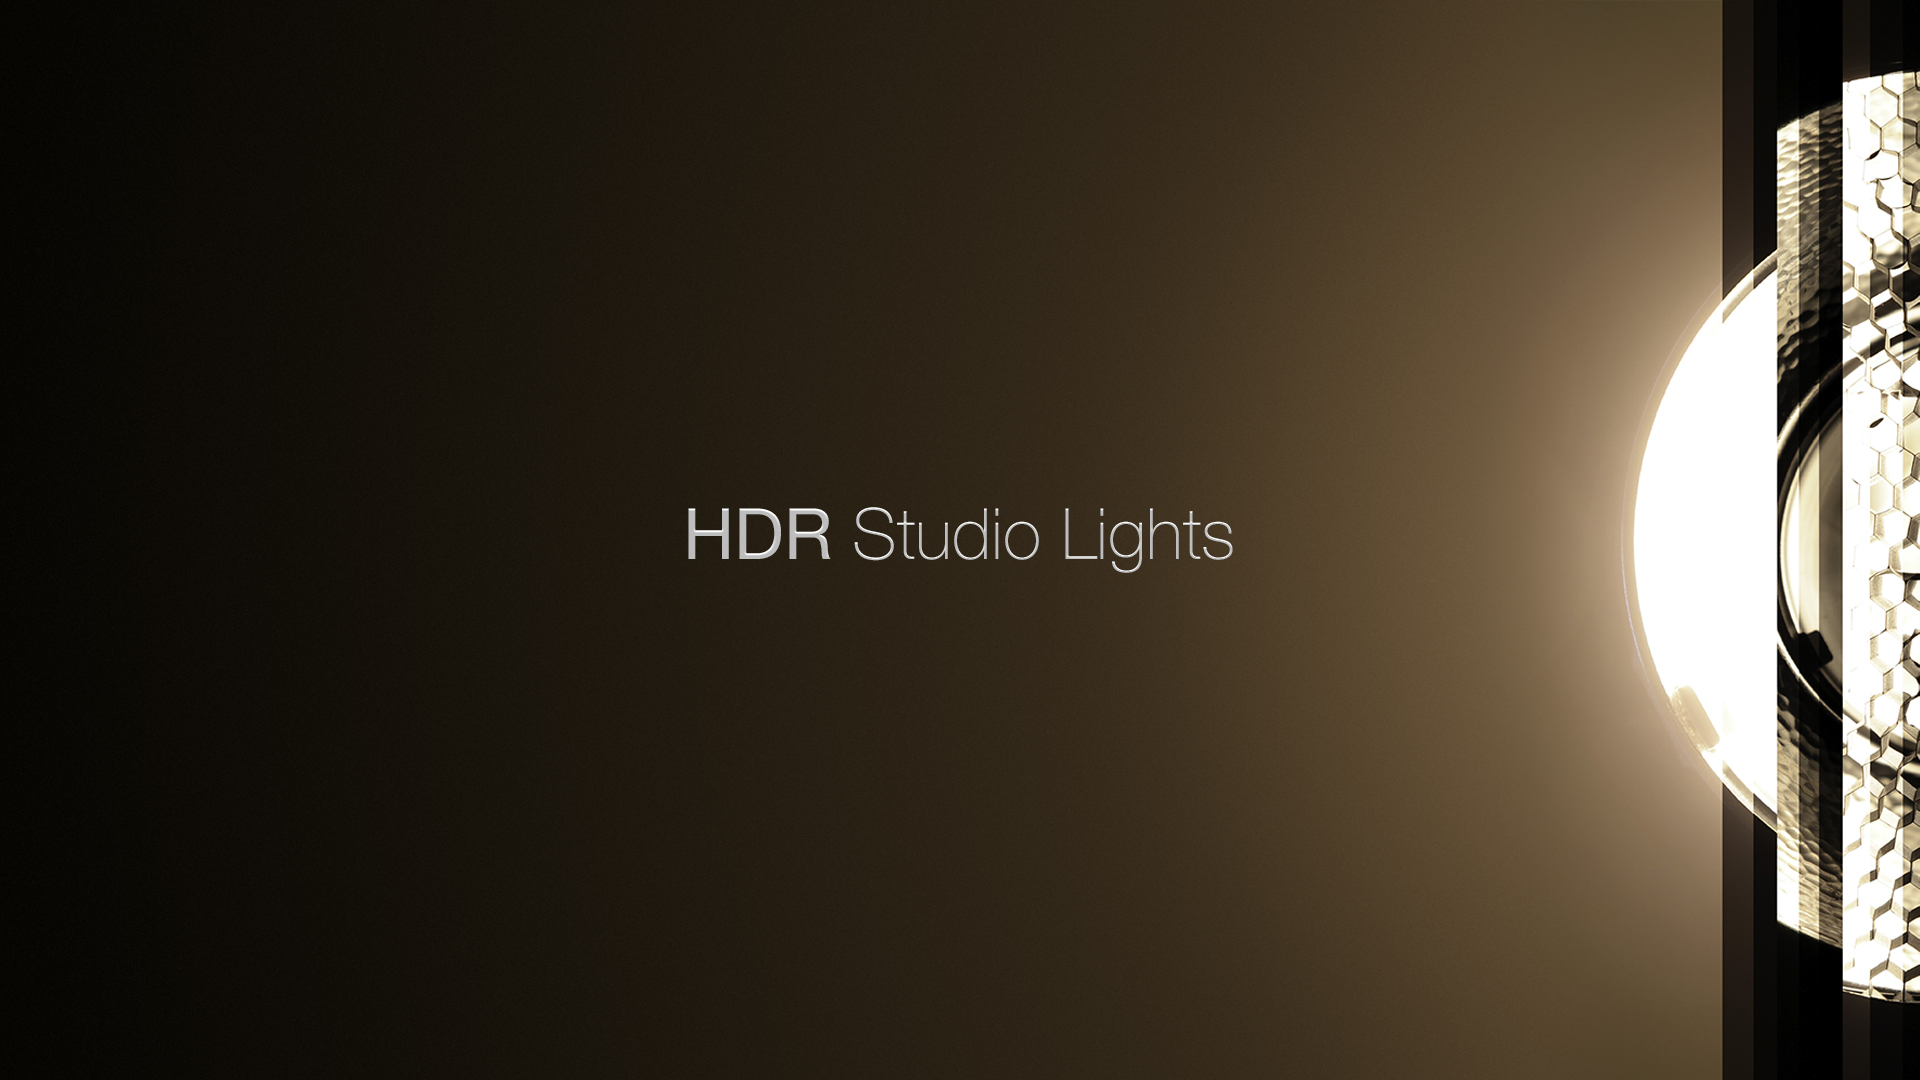 HDR Studio Lights | inlifethrill designs